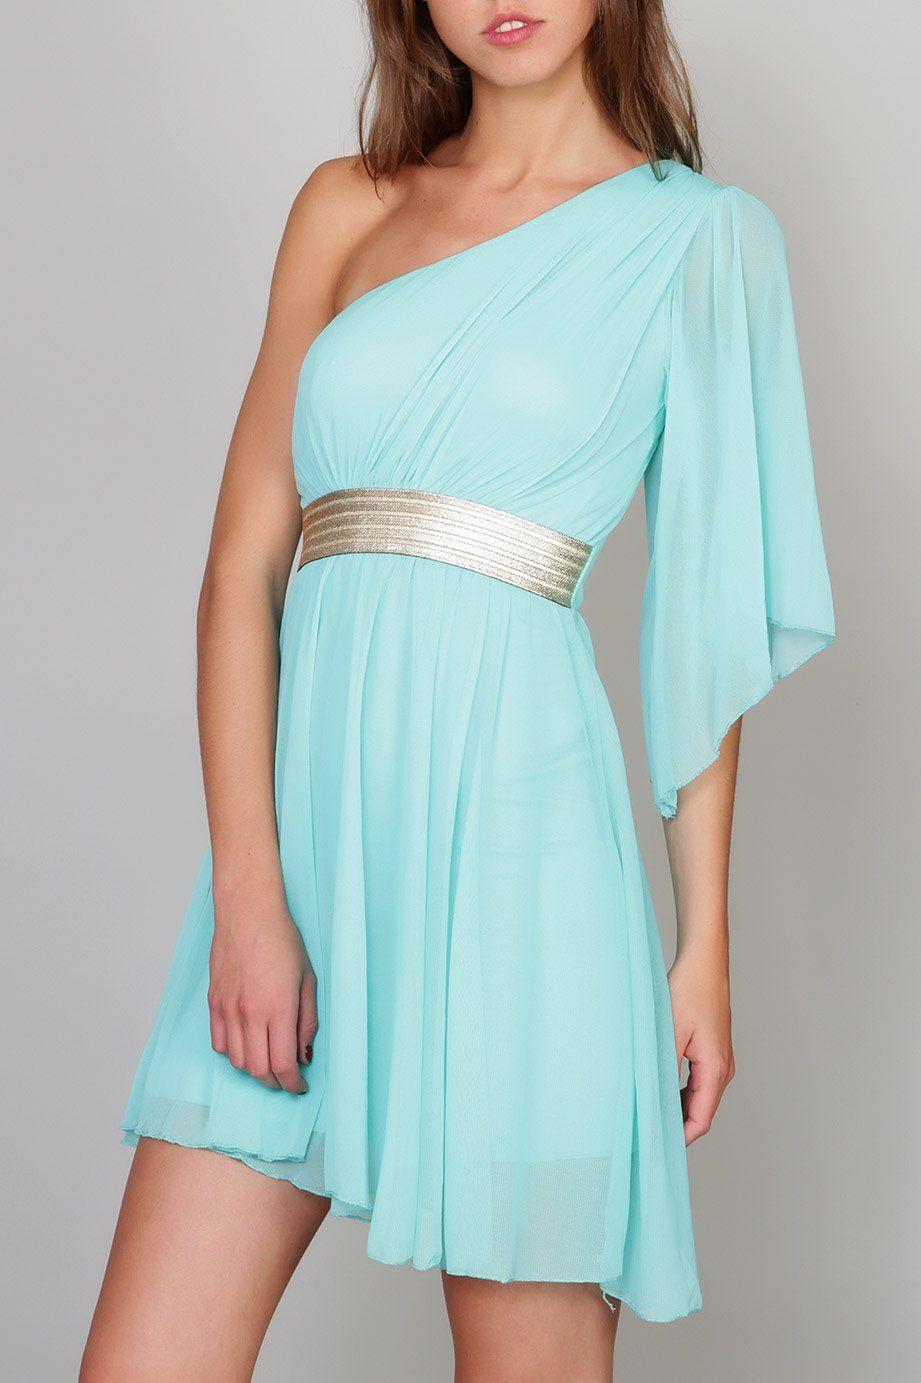 Vestido estilo griego asimétrico de Erikch | Mio | Pinterest ...